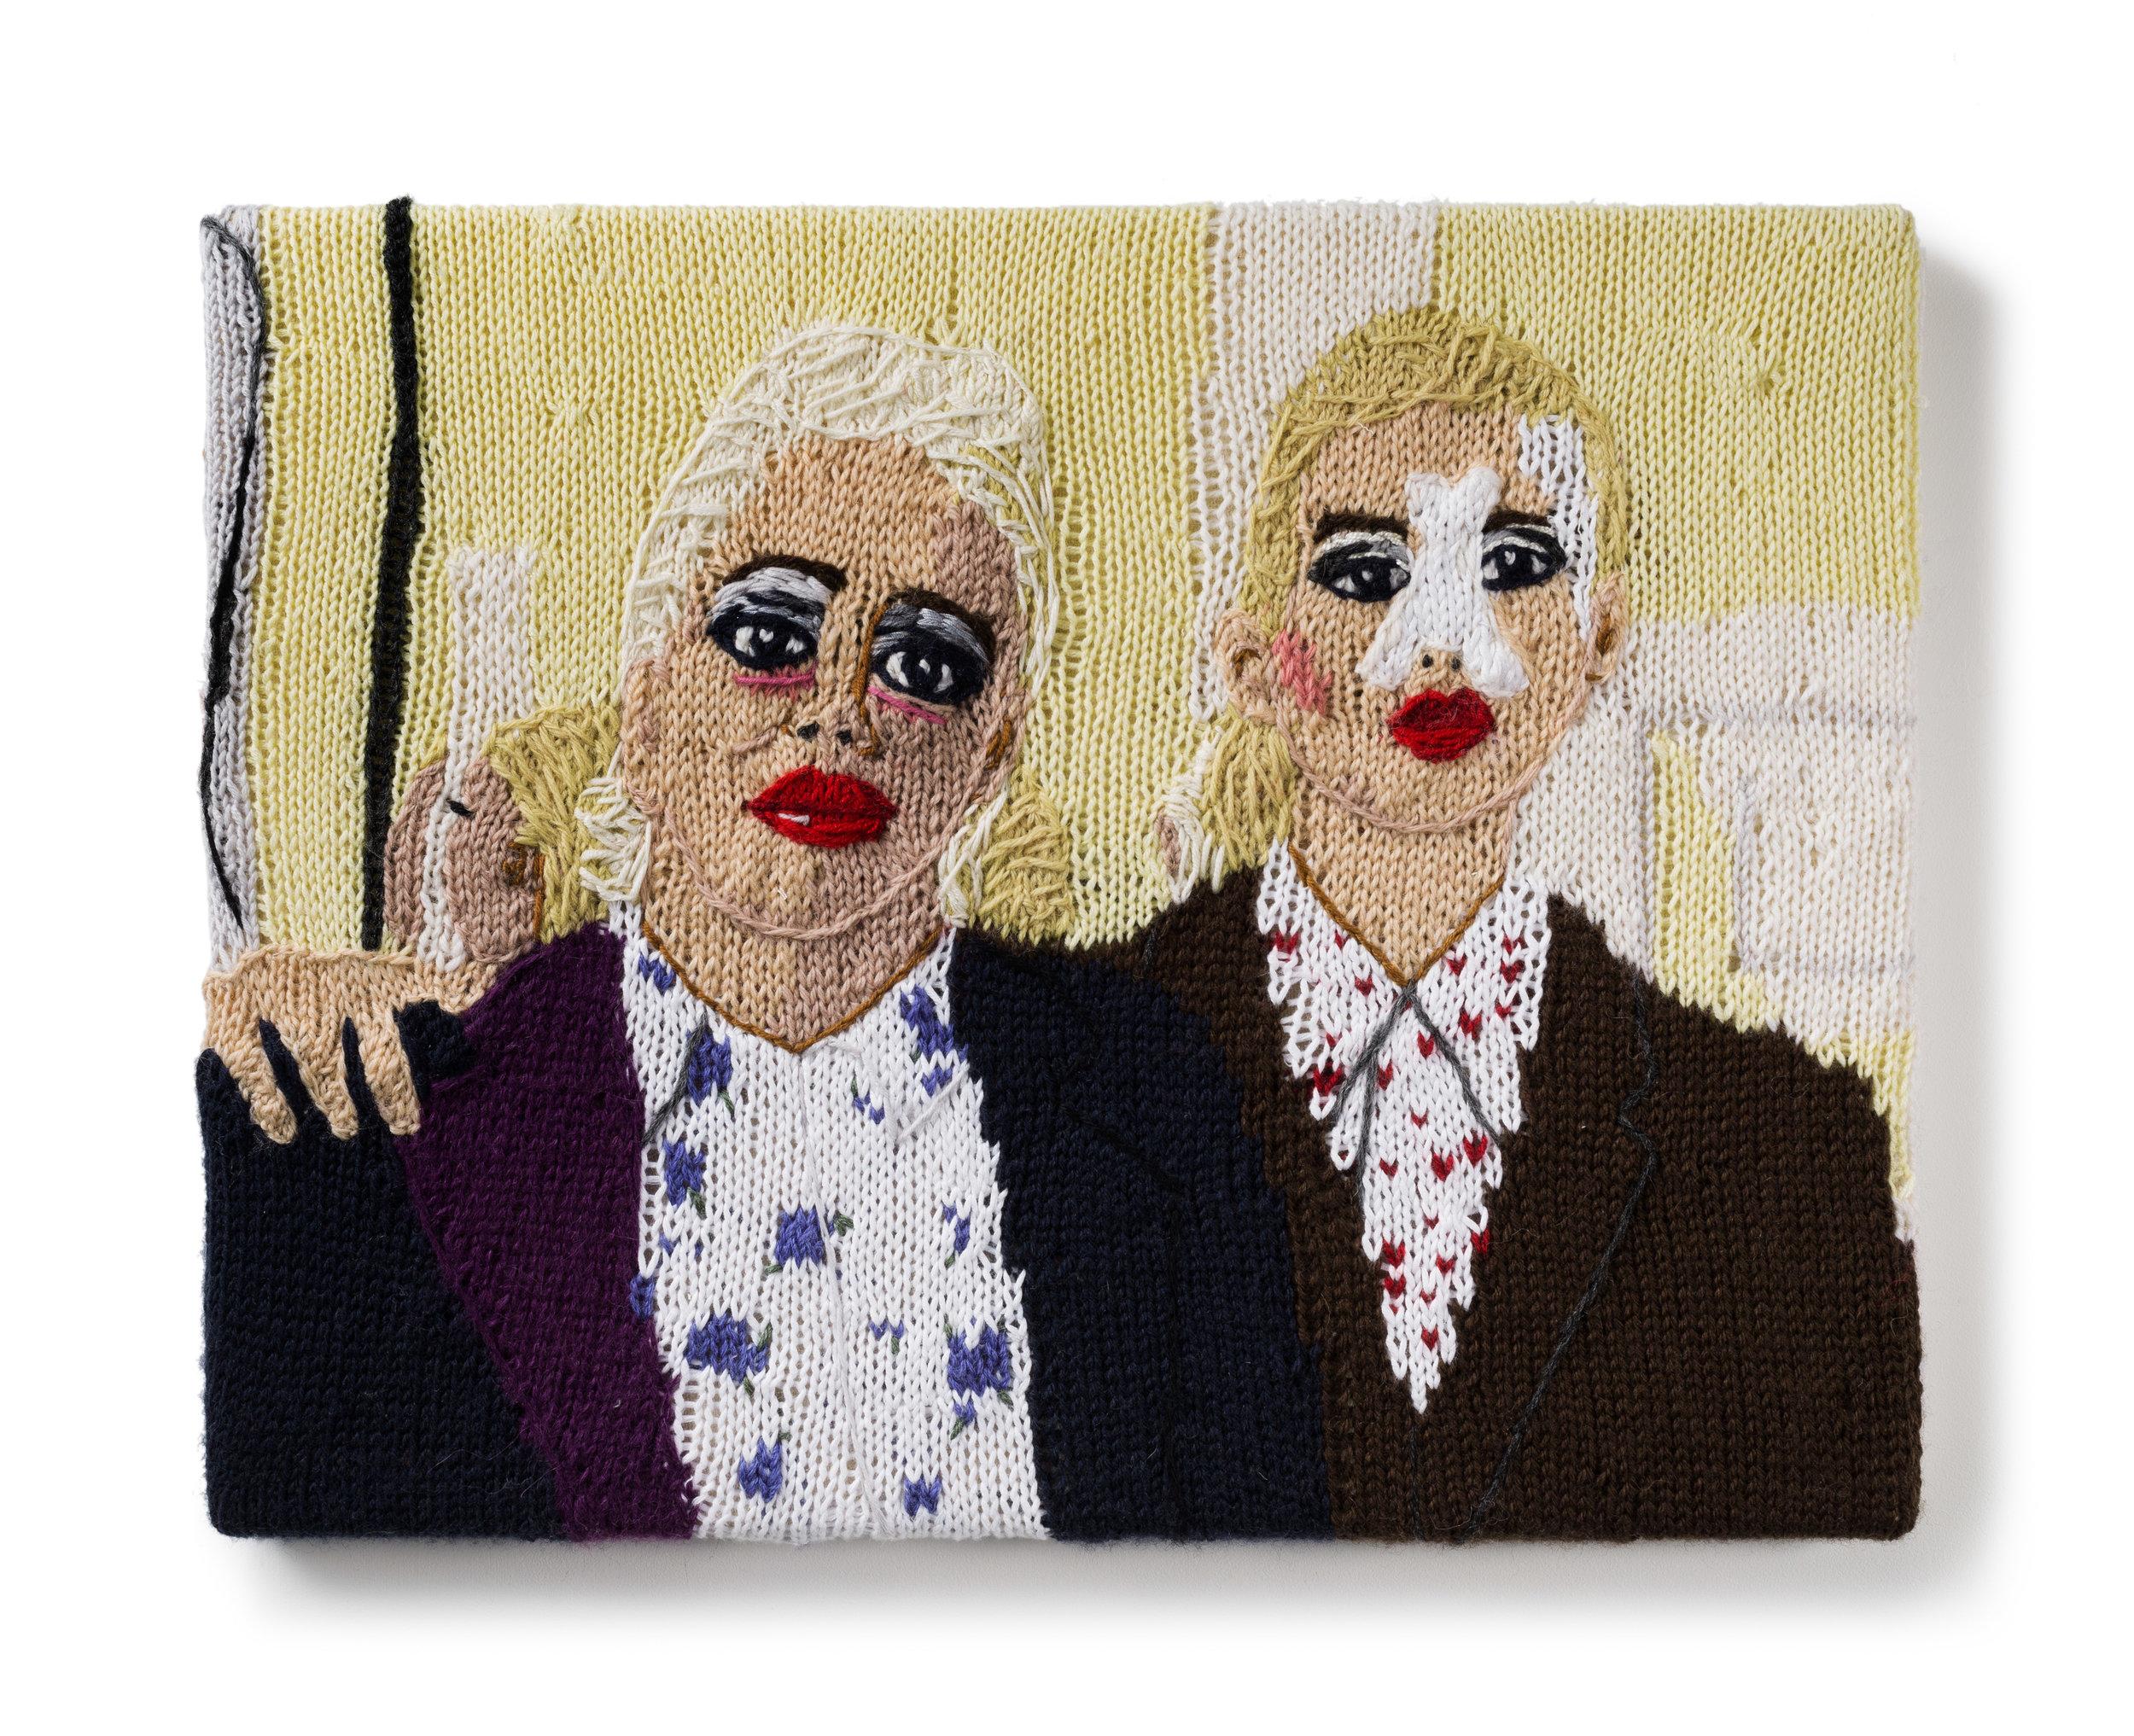 Kate Just, Feminist Fan #35 (Genesis Breyer P-Orridge and Lady Jaye Breyer P-Orridge, film still from The Bight of the Twin dir. Hazel Hill McCarthy III, 2014), 2017